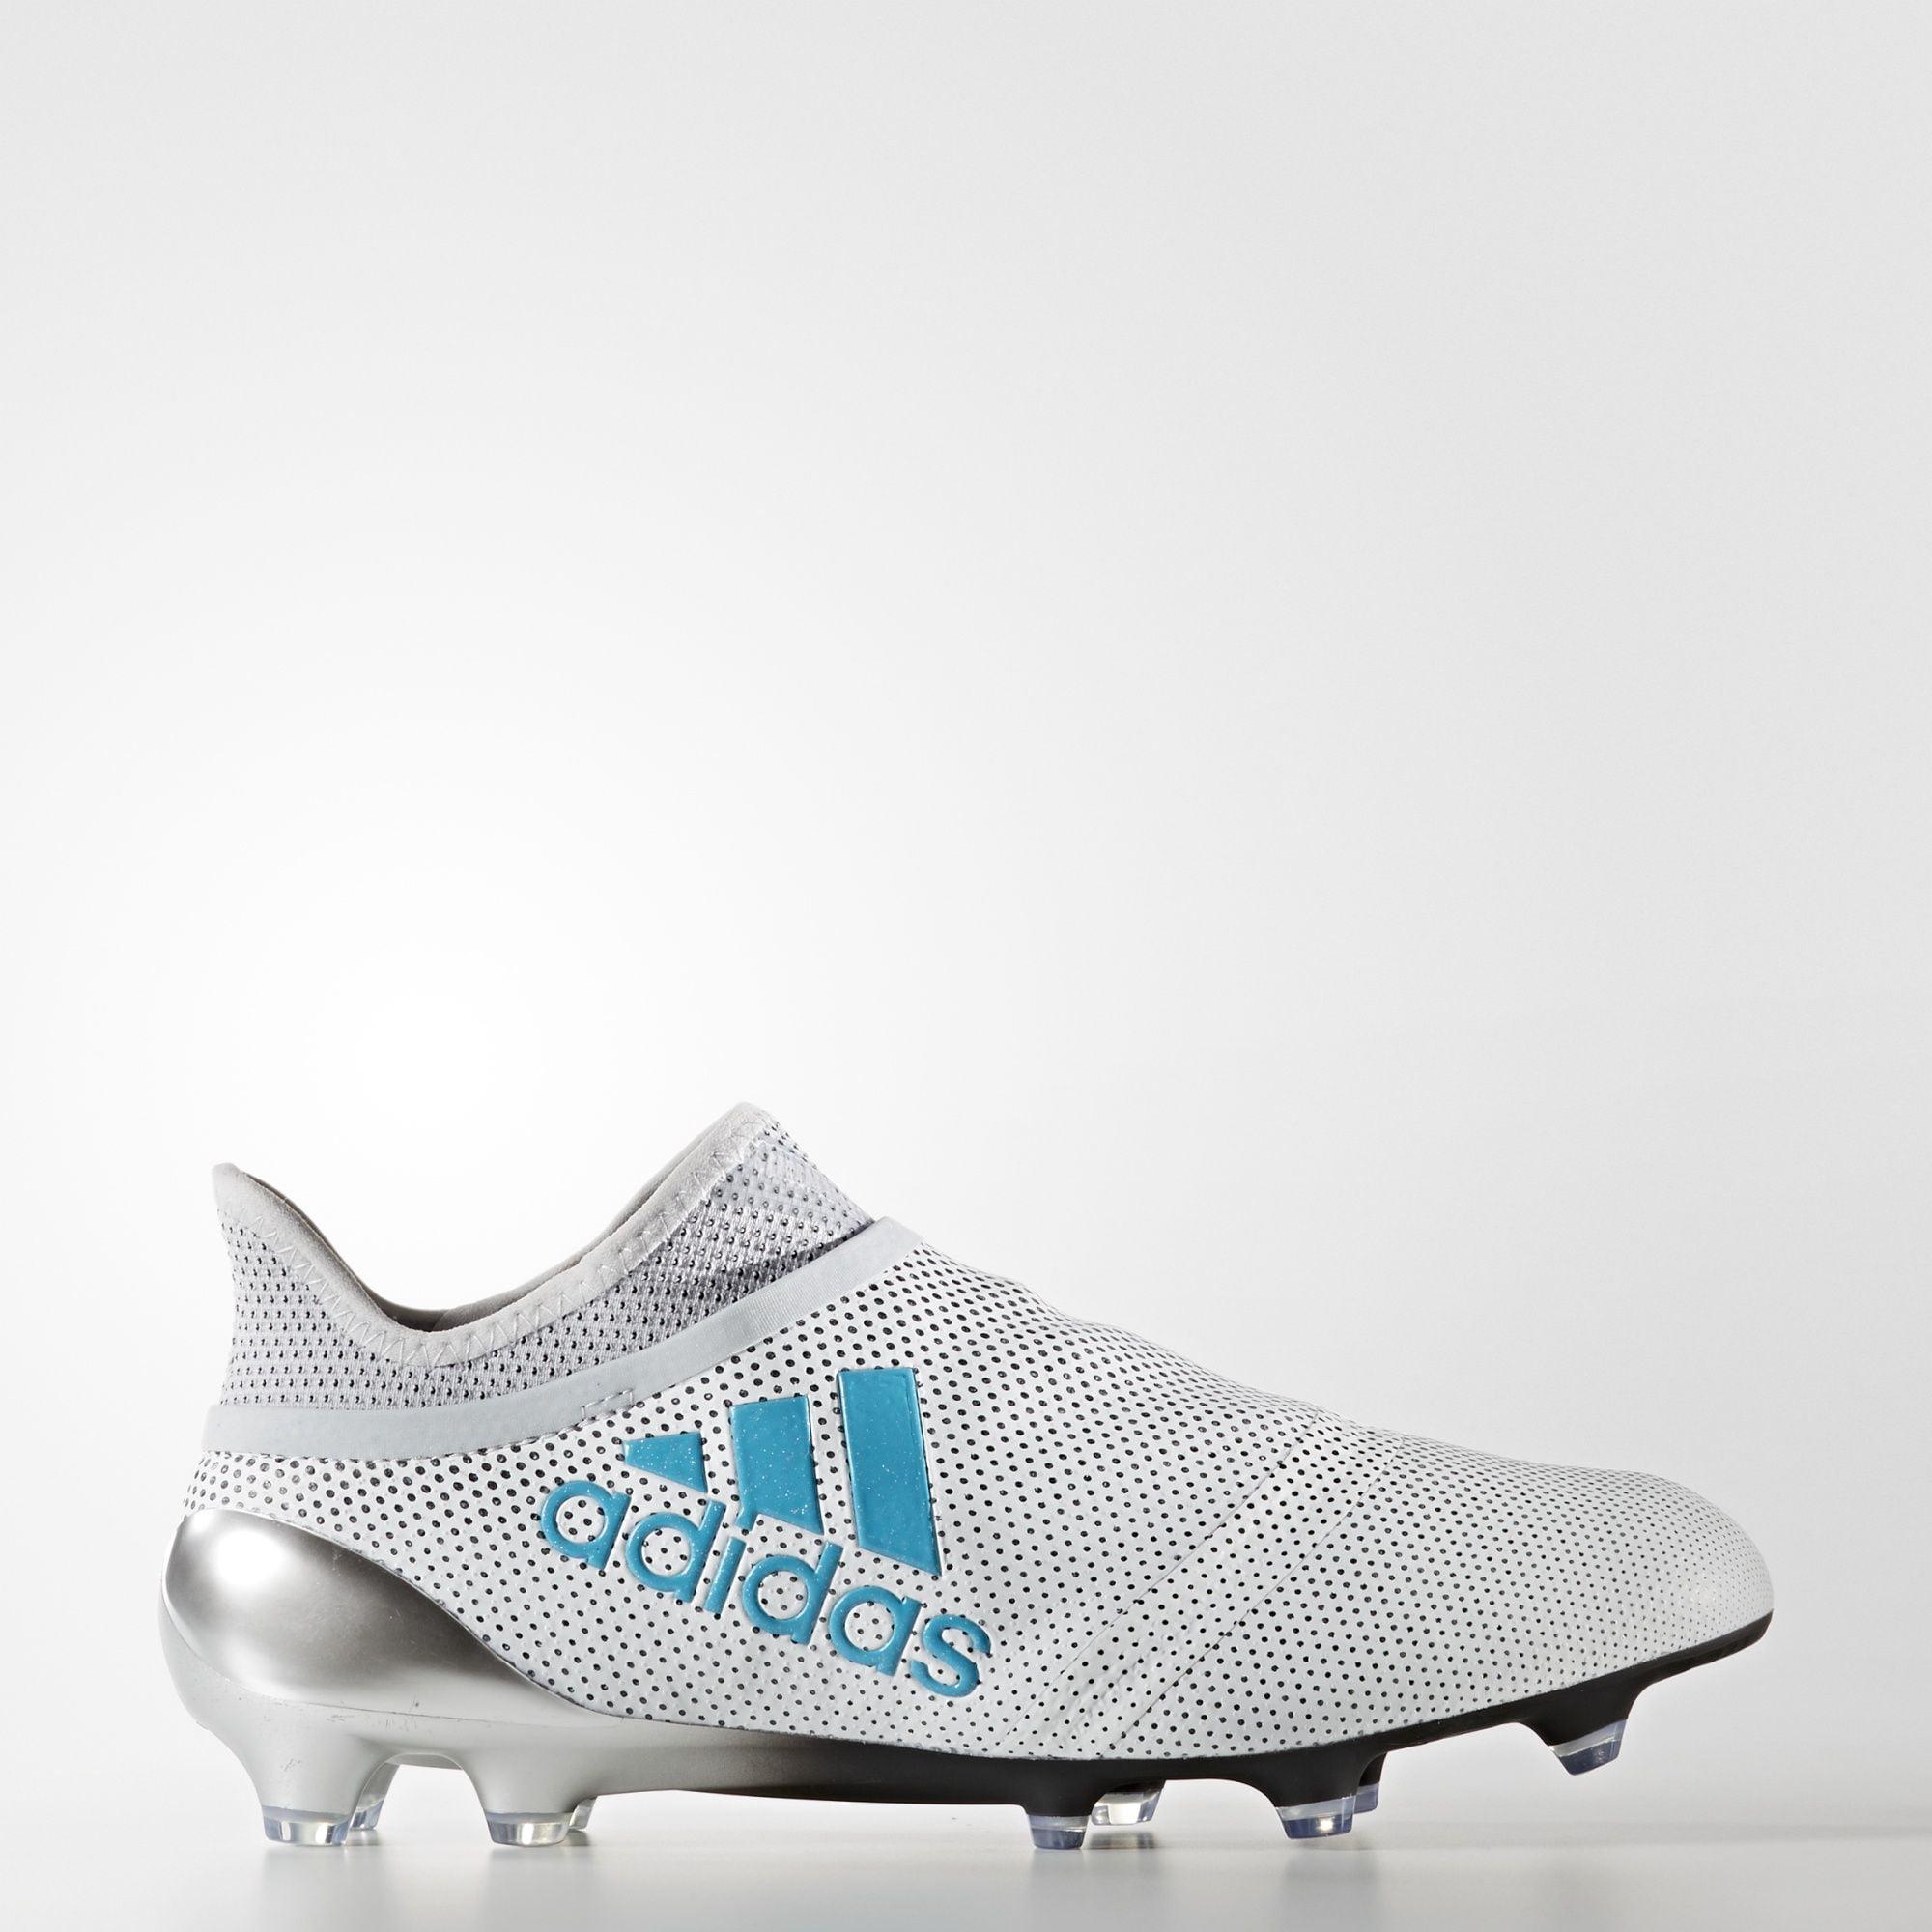 5e46310d1 Adidas X 17+ PureChaos FG Men's Laceless Boots - Playo